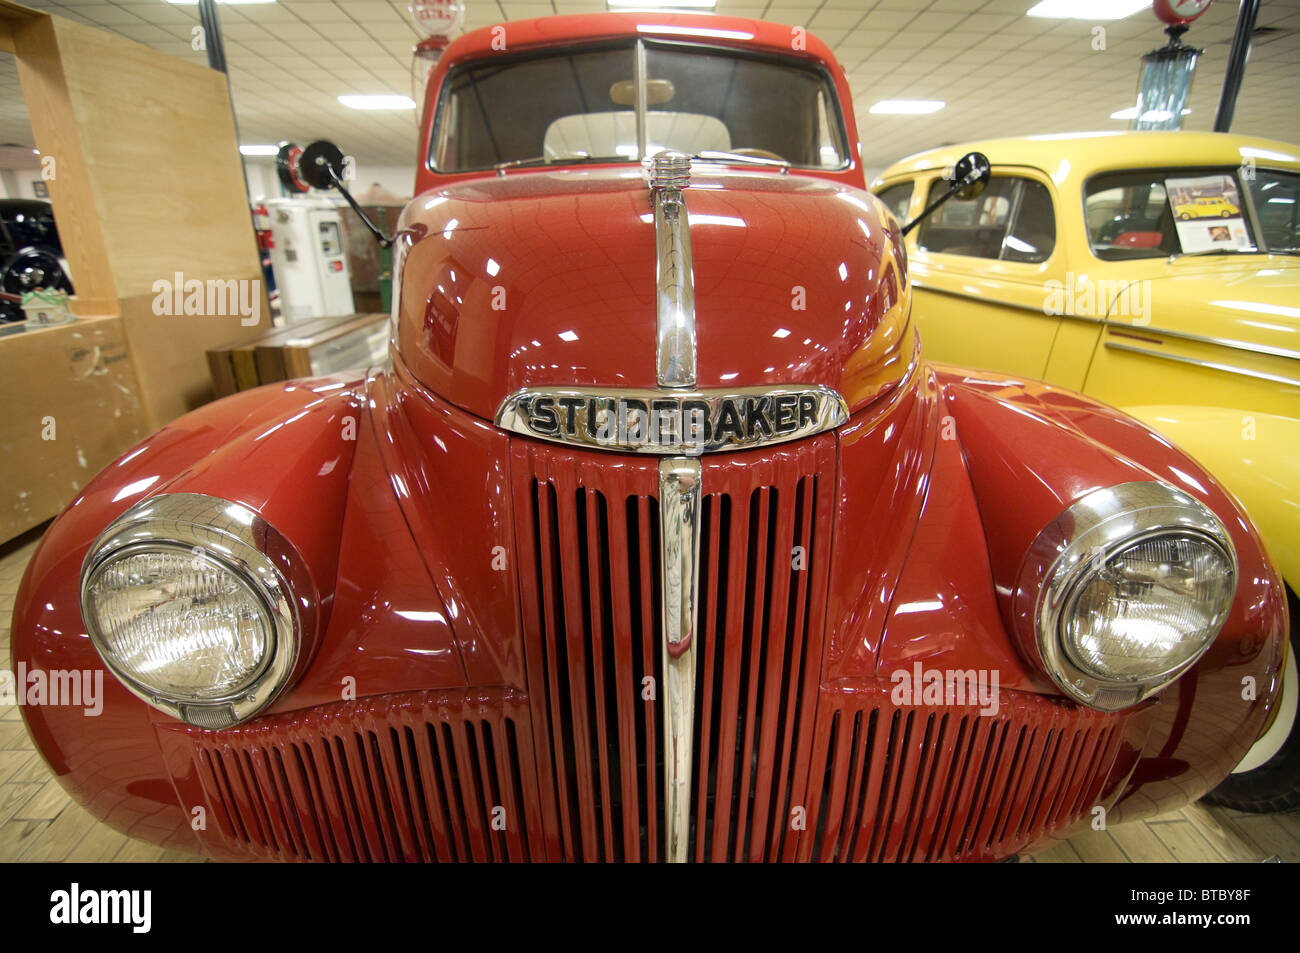 Don Garlits Museum of Classic Automobiles Ocala Florida 1948 Studebaker half-ton pick up truck - Stock Image